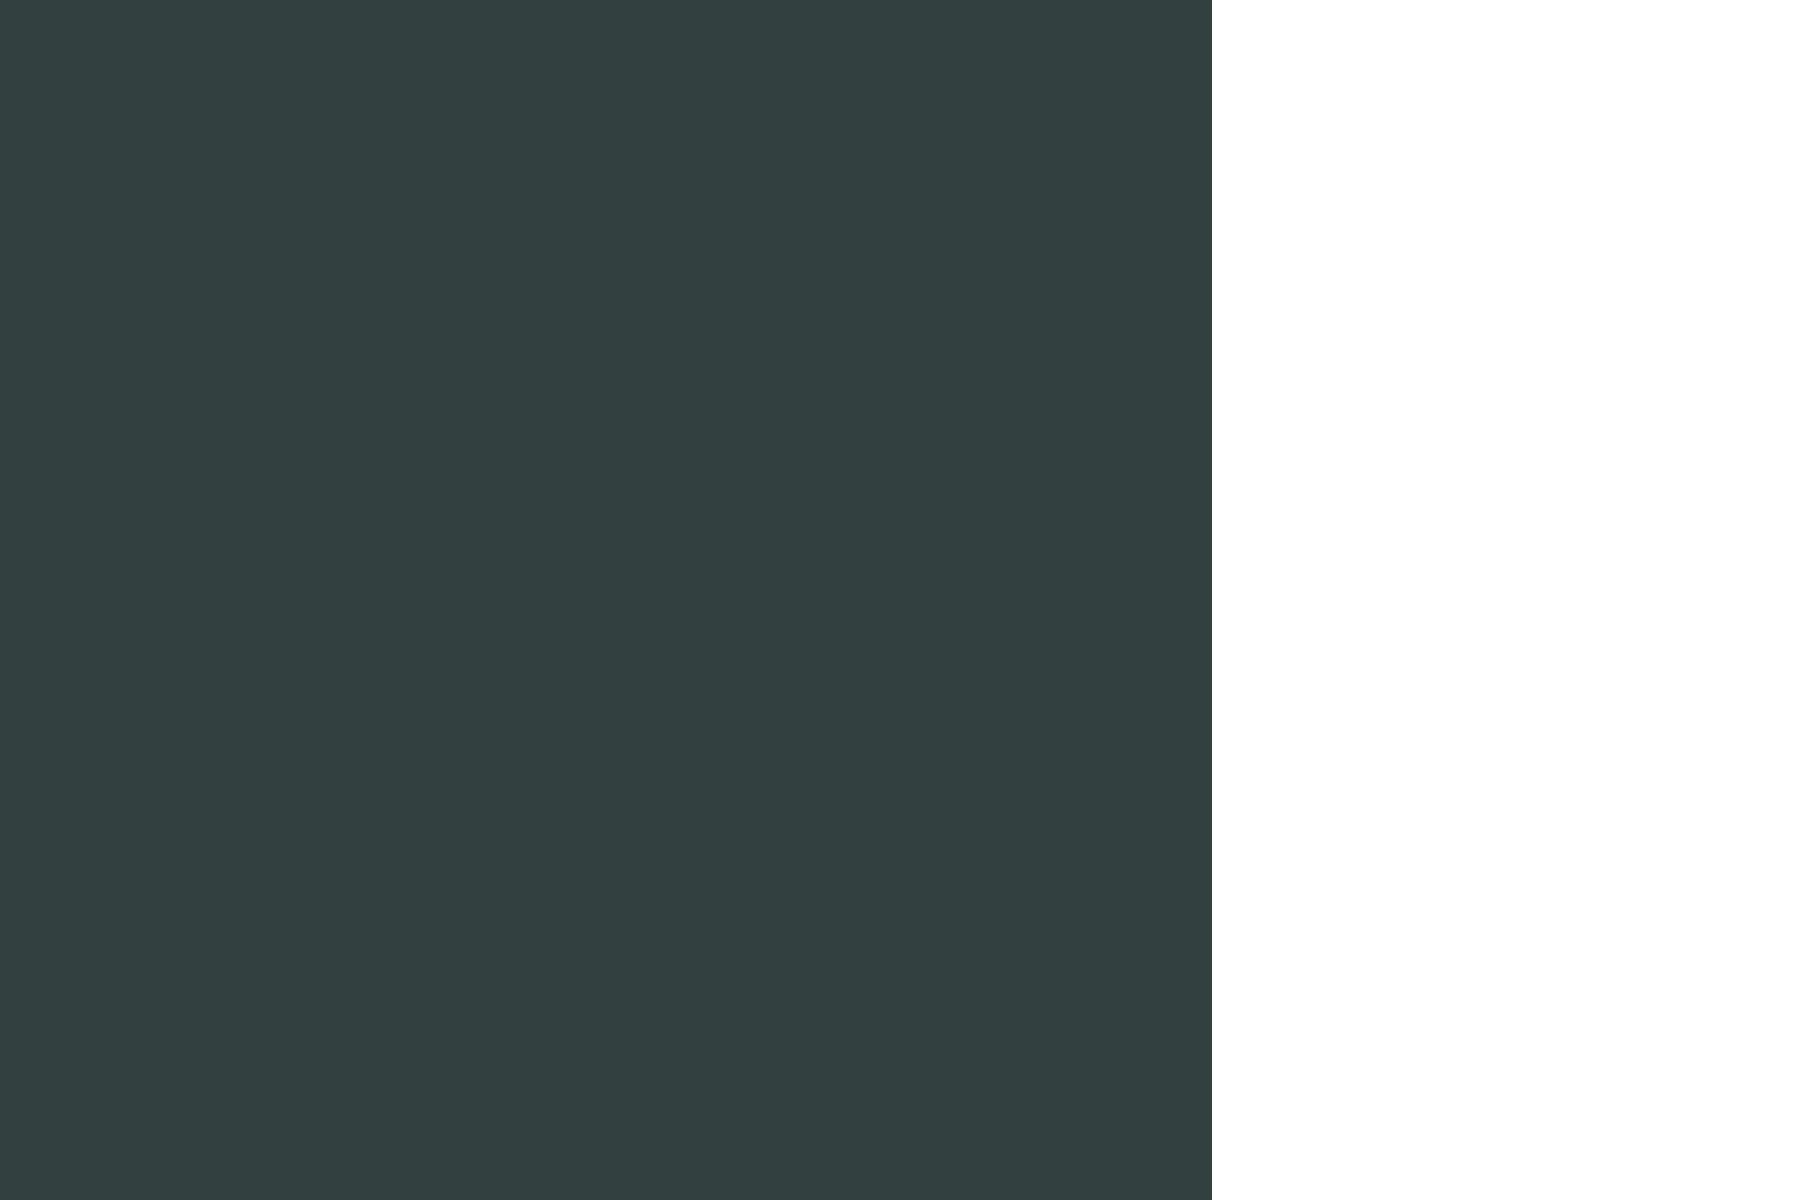 slide fade